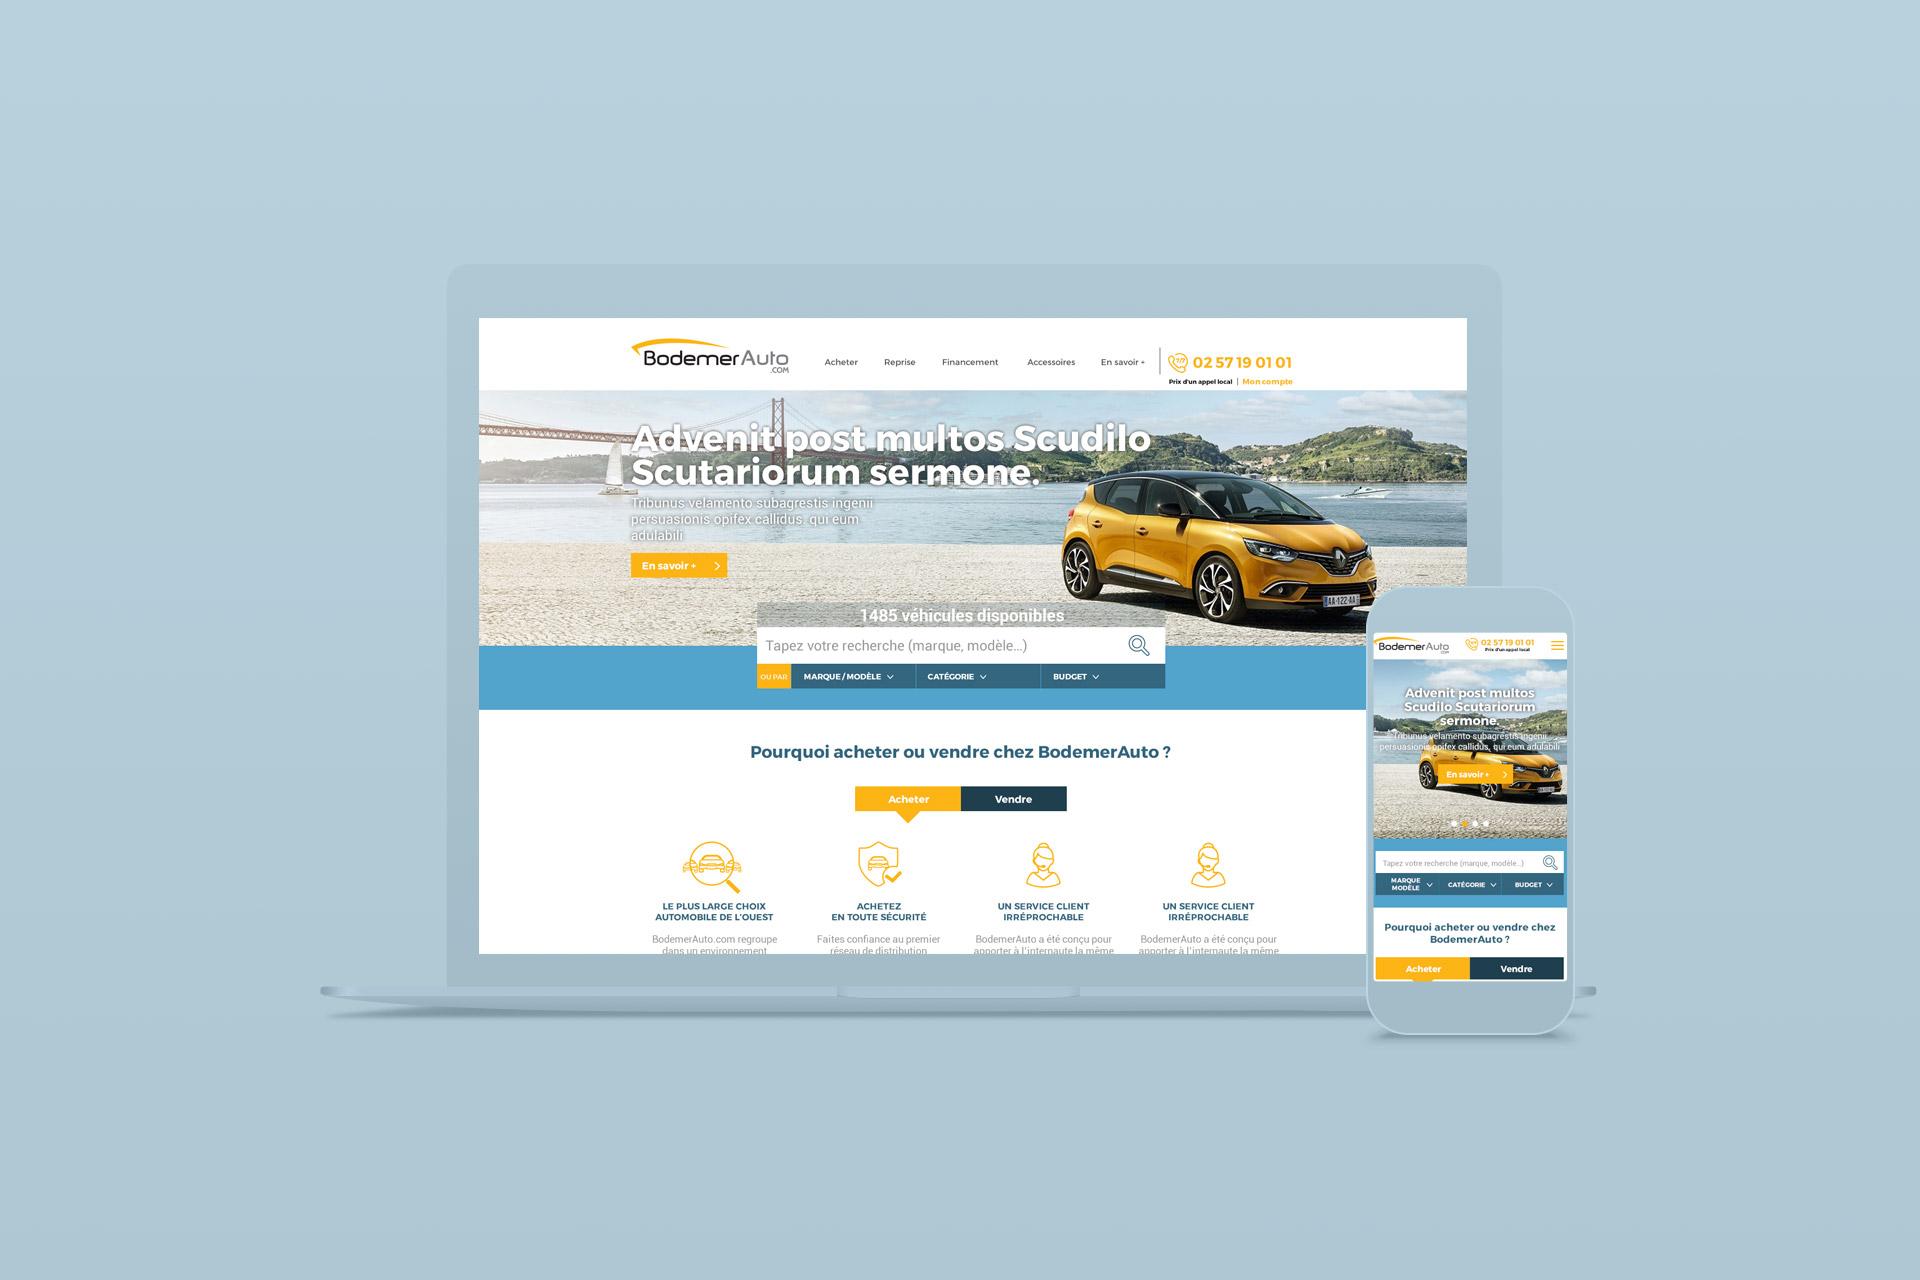 Refonte graphique et webdesign du site internet de BodemerAuto